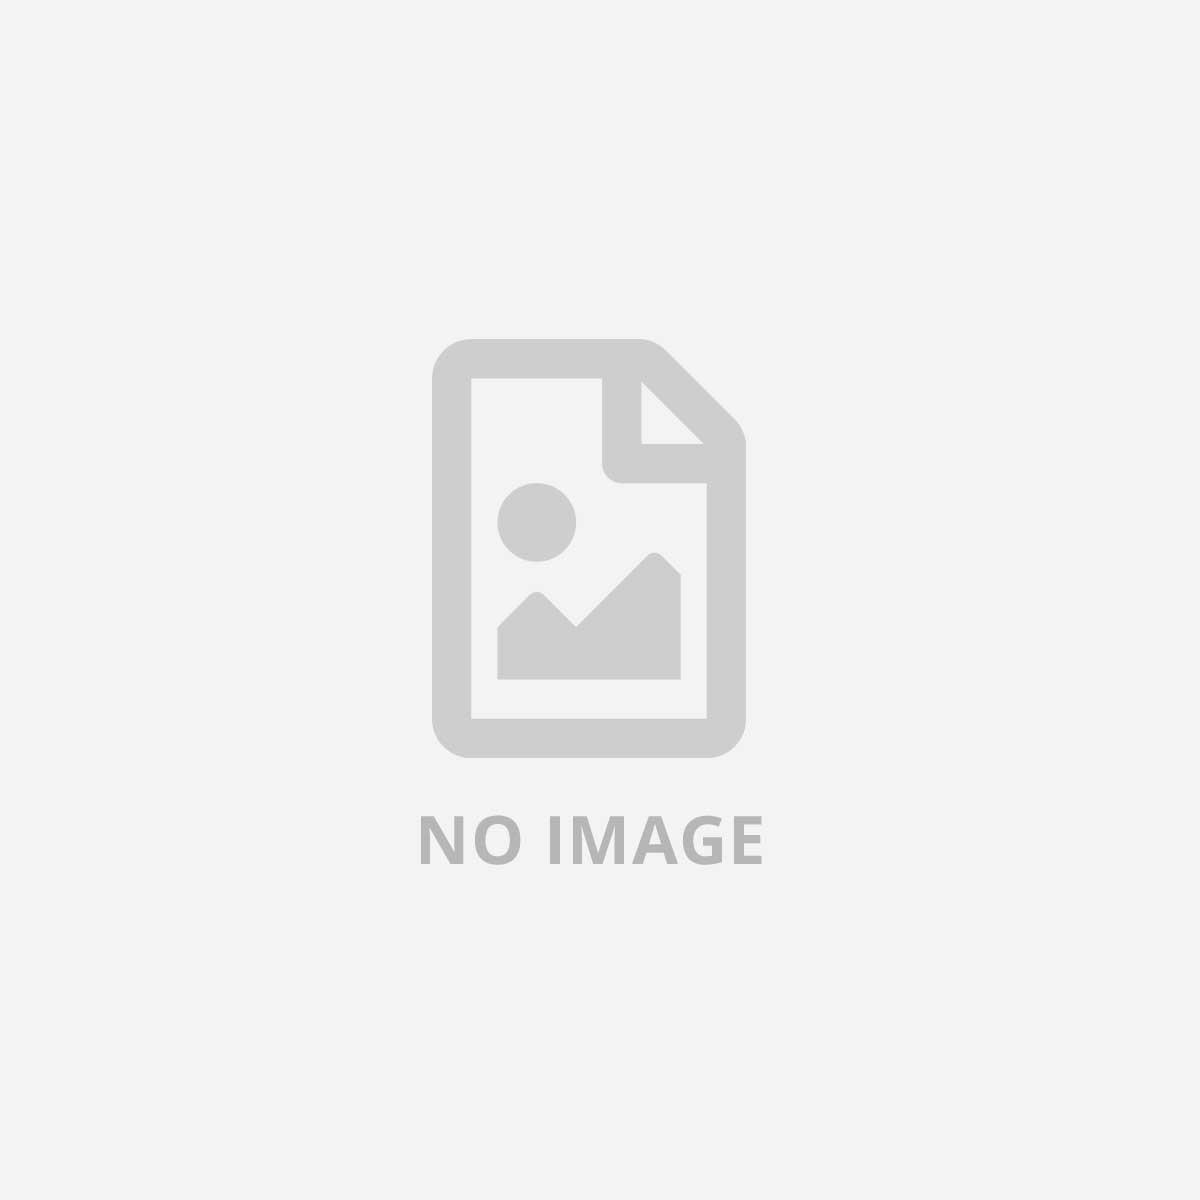 AEROHIVE NETWORKS CEILING MNT BRCKTAP122 AP122X AP130